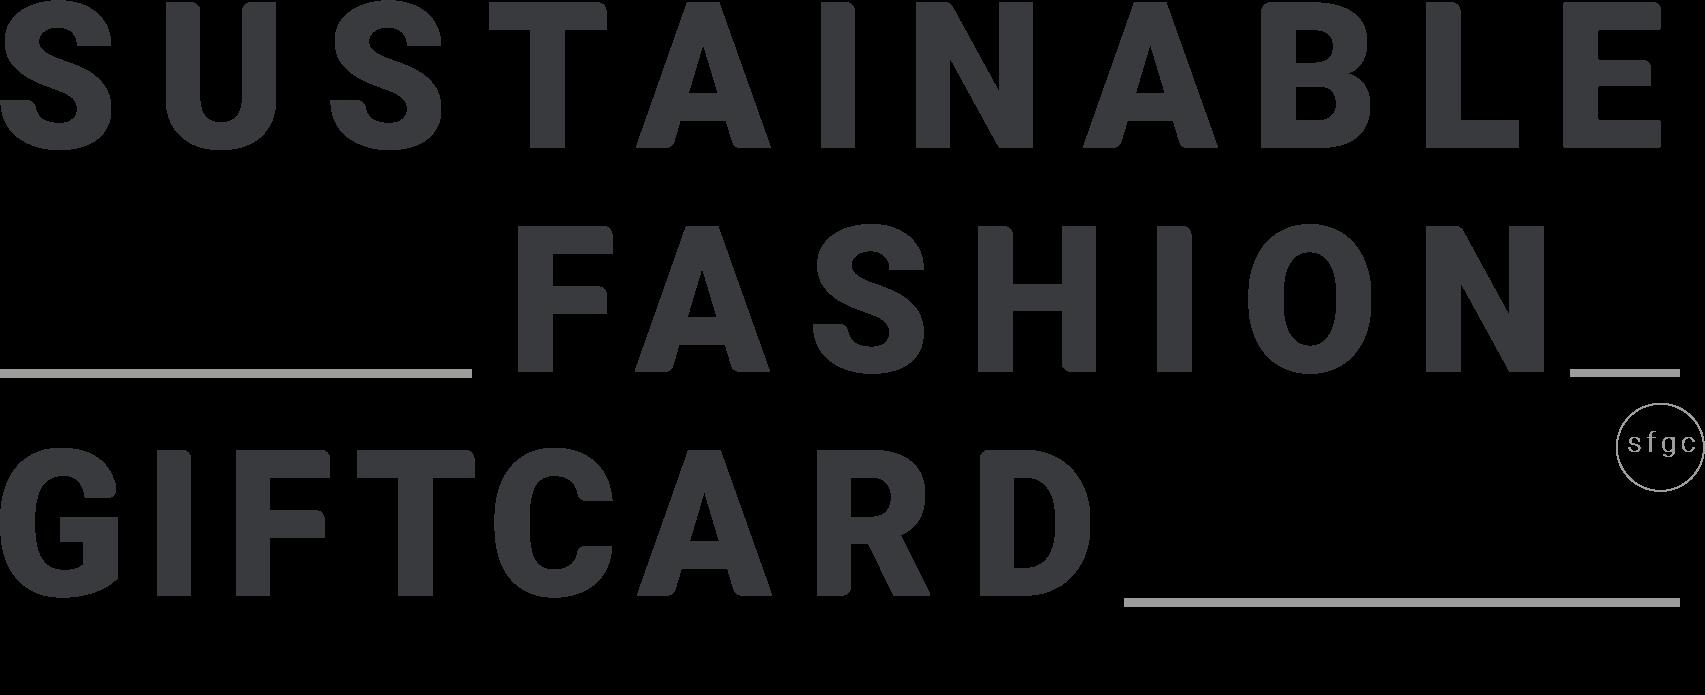 Logo-sustainable-fashion-gift-card-NO-TAGLINE